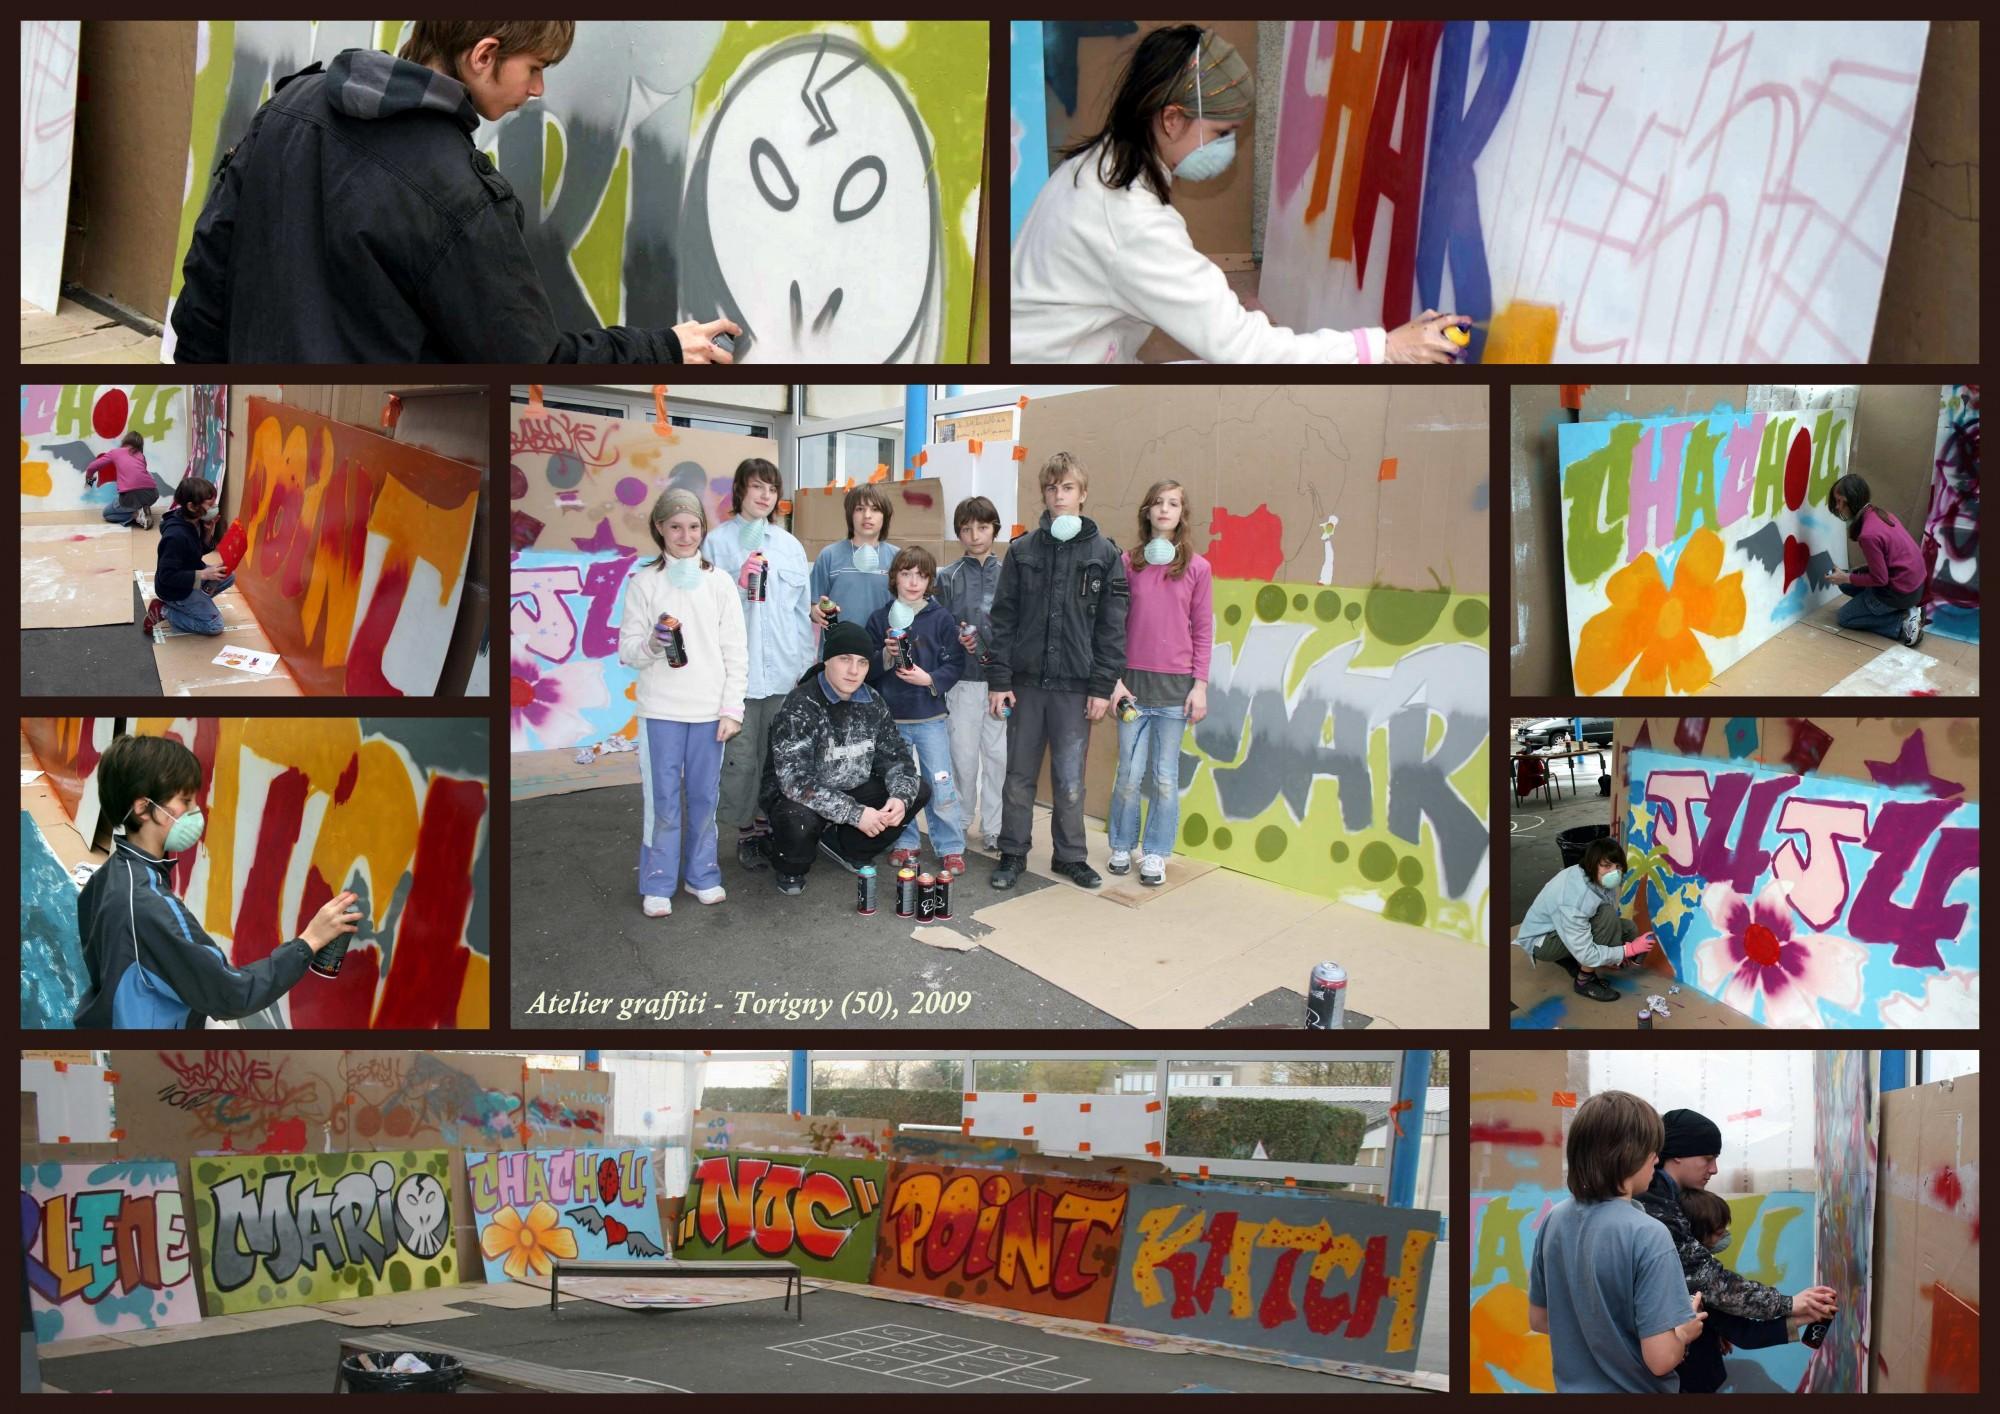 Atelier graffiti 2009